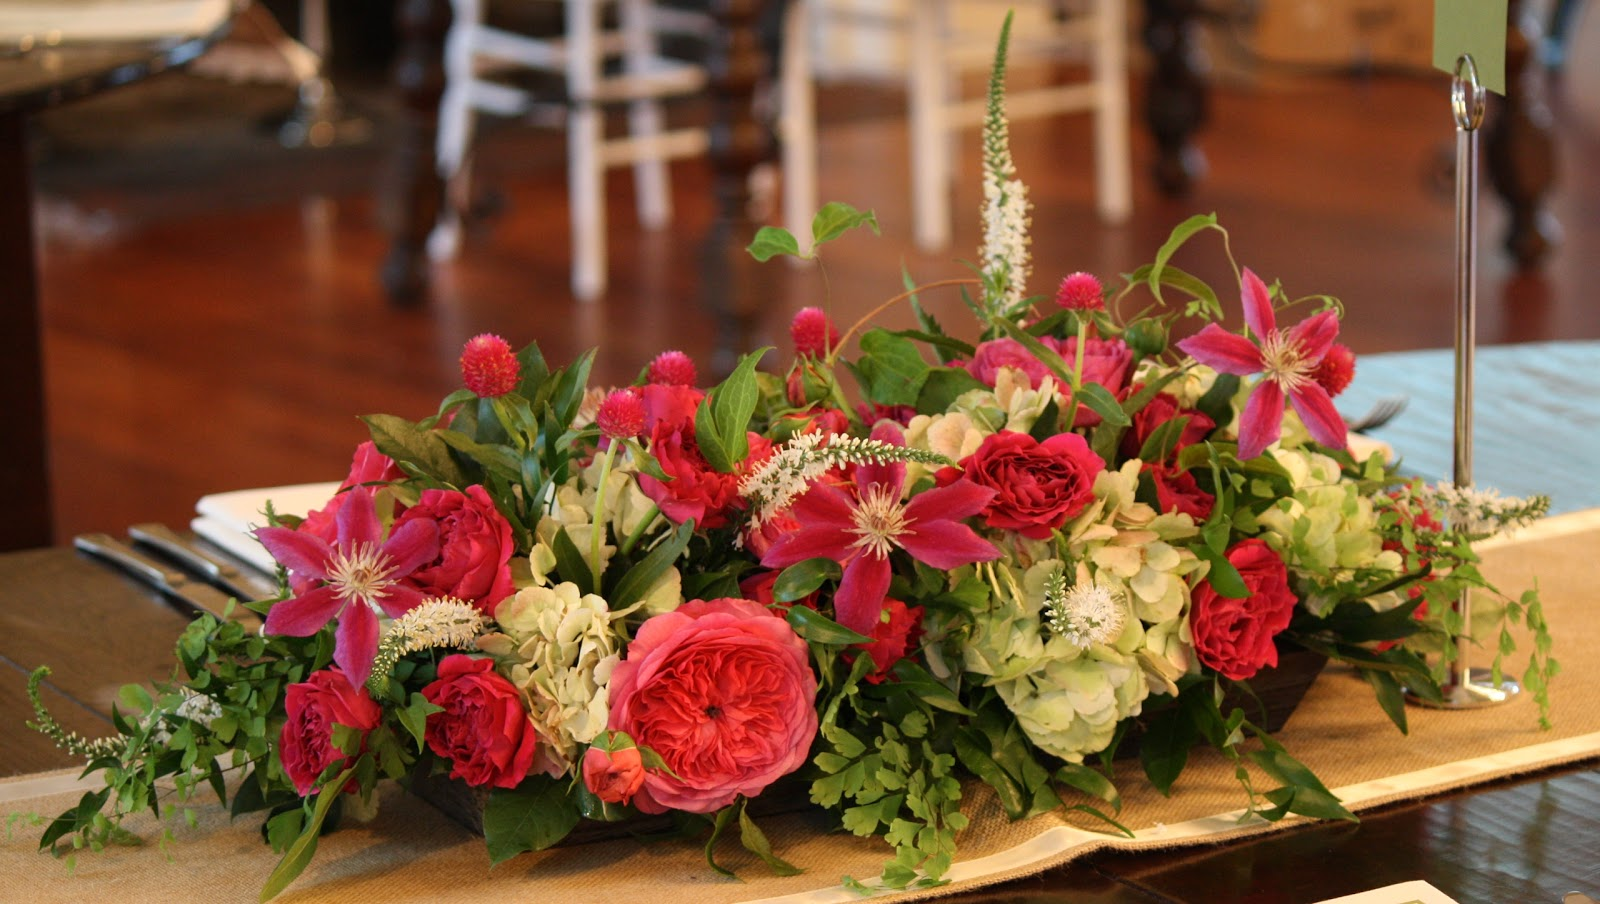 Splendid stems floral designs wedding flowers